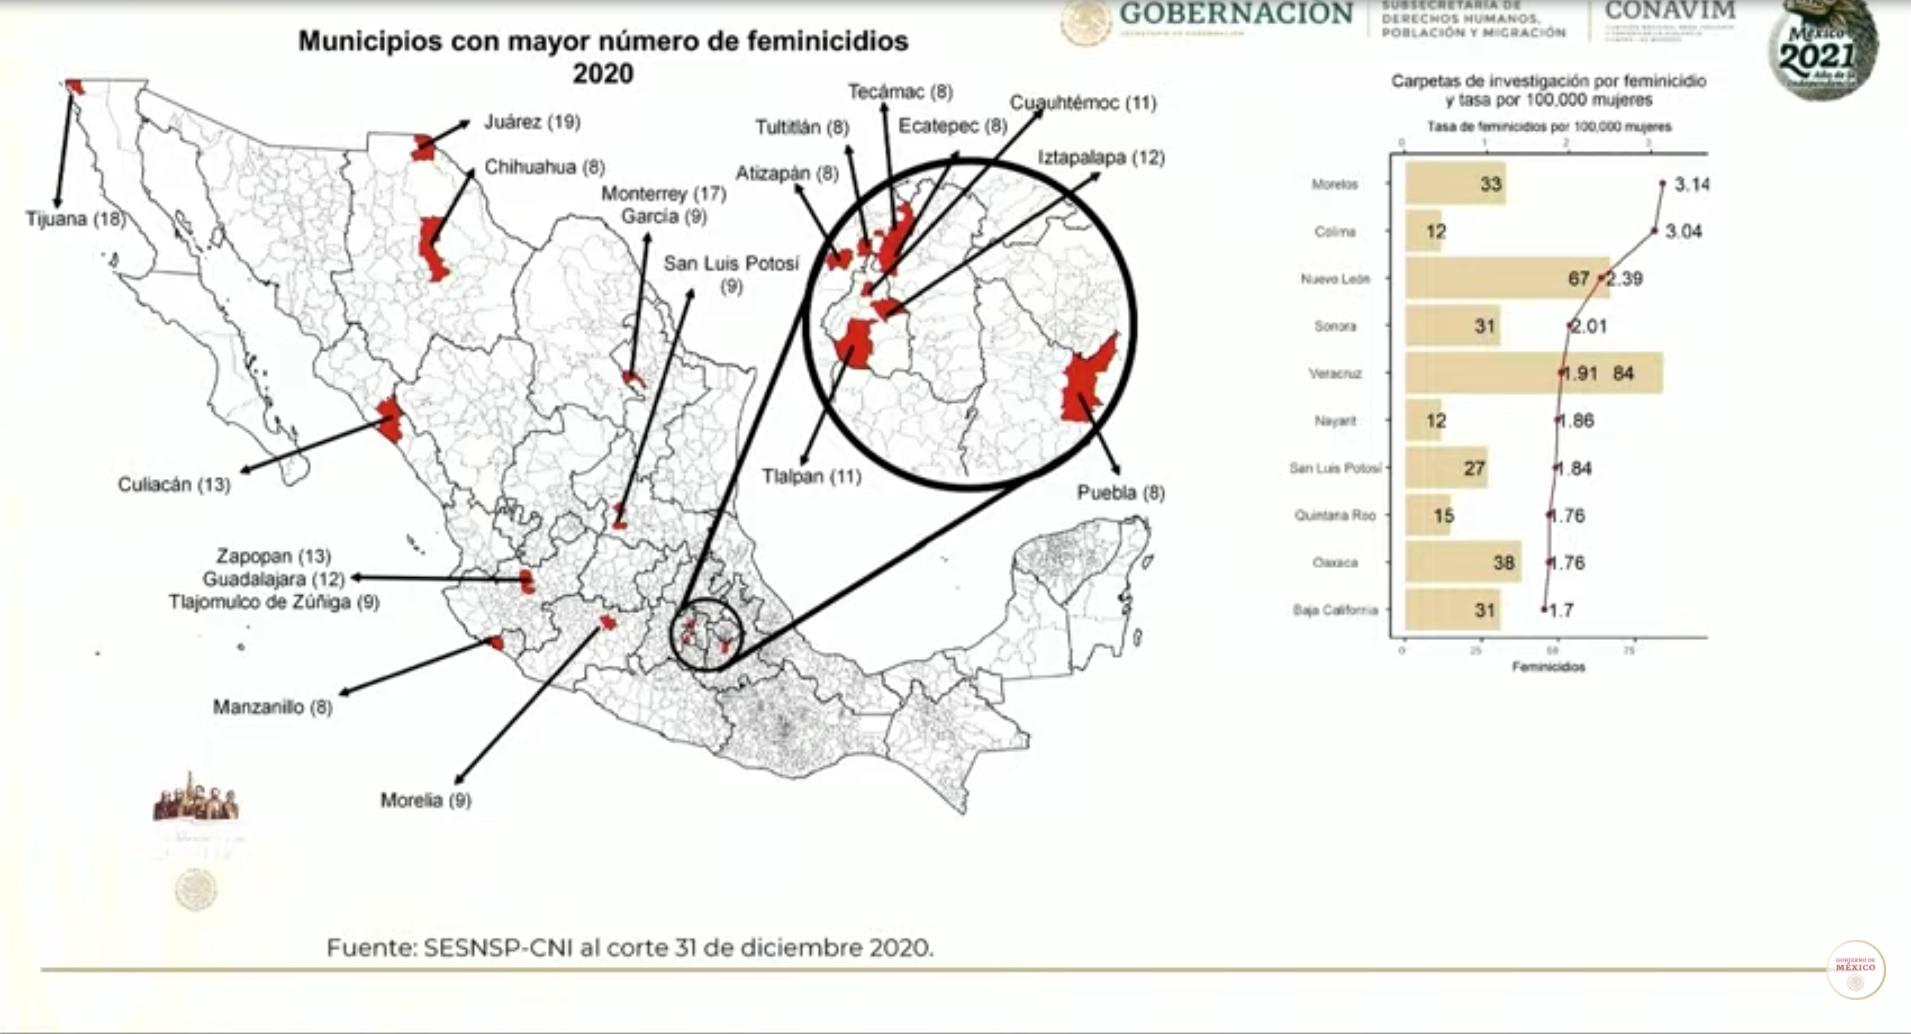 municipios con más feminicidios mexico 2020